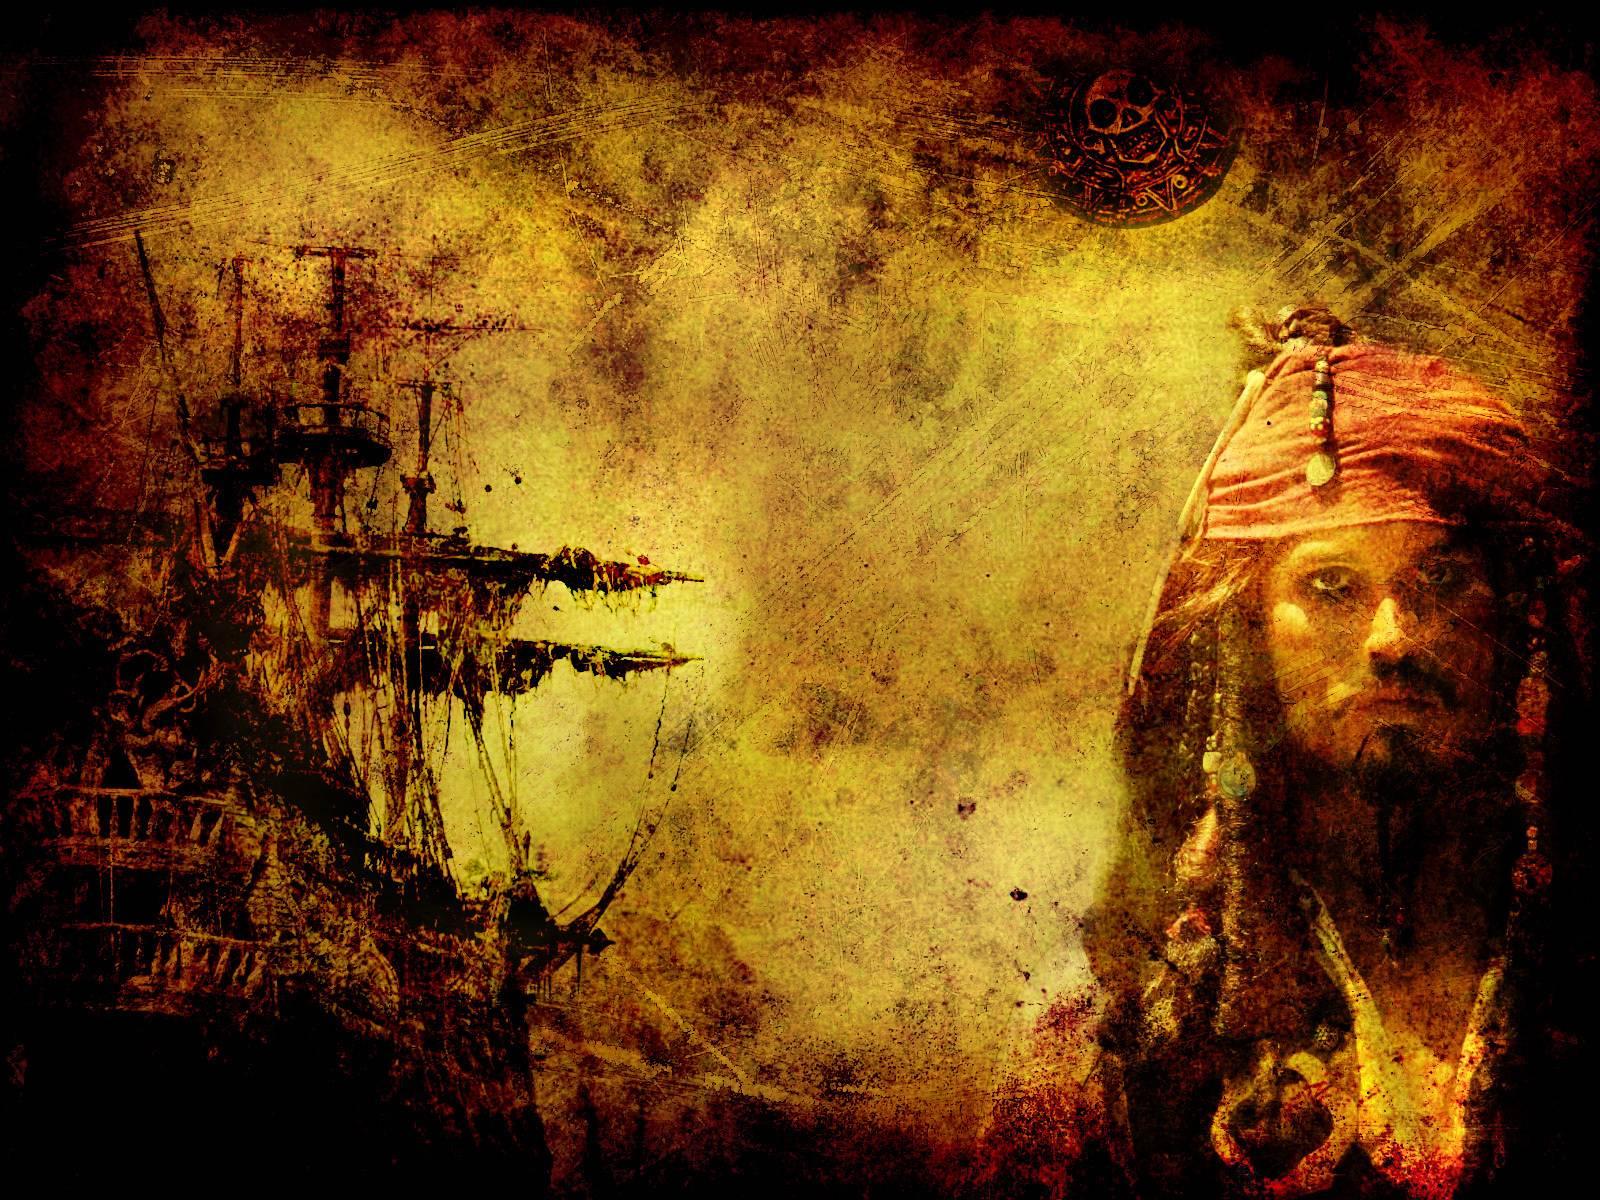 Captain Jack Sparrow Hd Wallpaper - Black Pearl Jack Sparrow , HD Wallpaper & Backgrounds